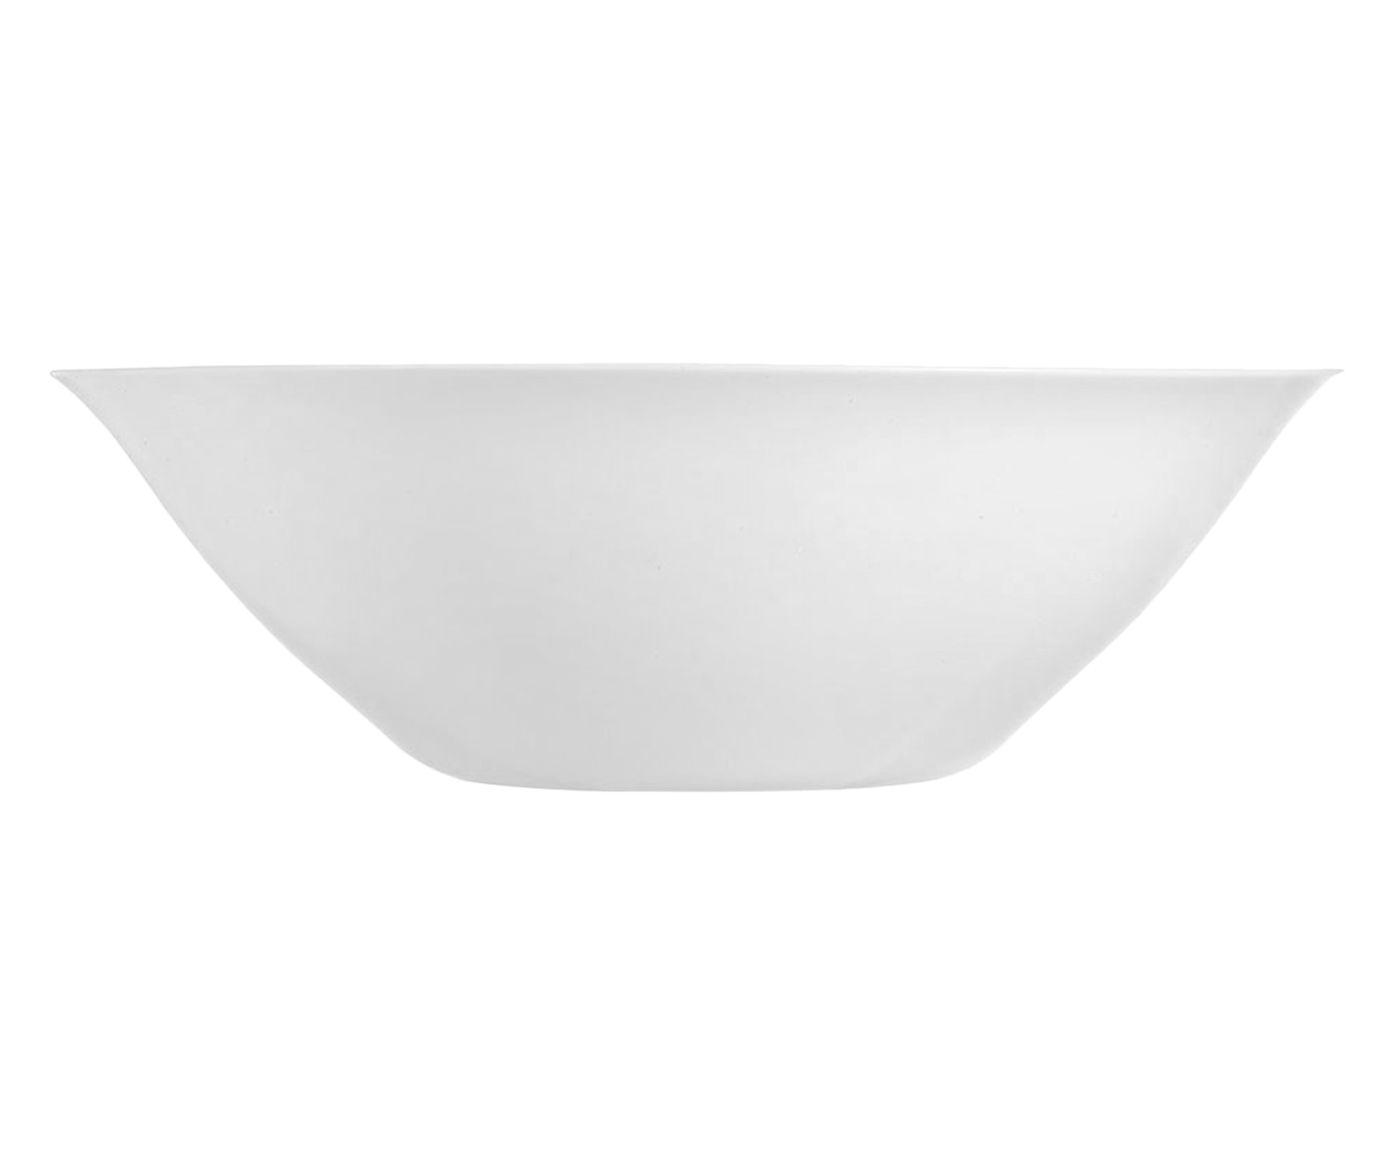 Saladeira Carine Branca - 2,4L   Westwing.com.br